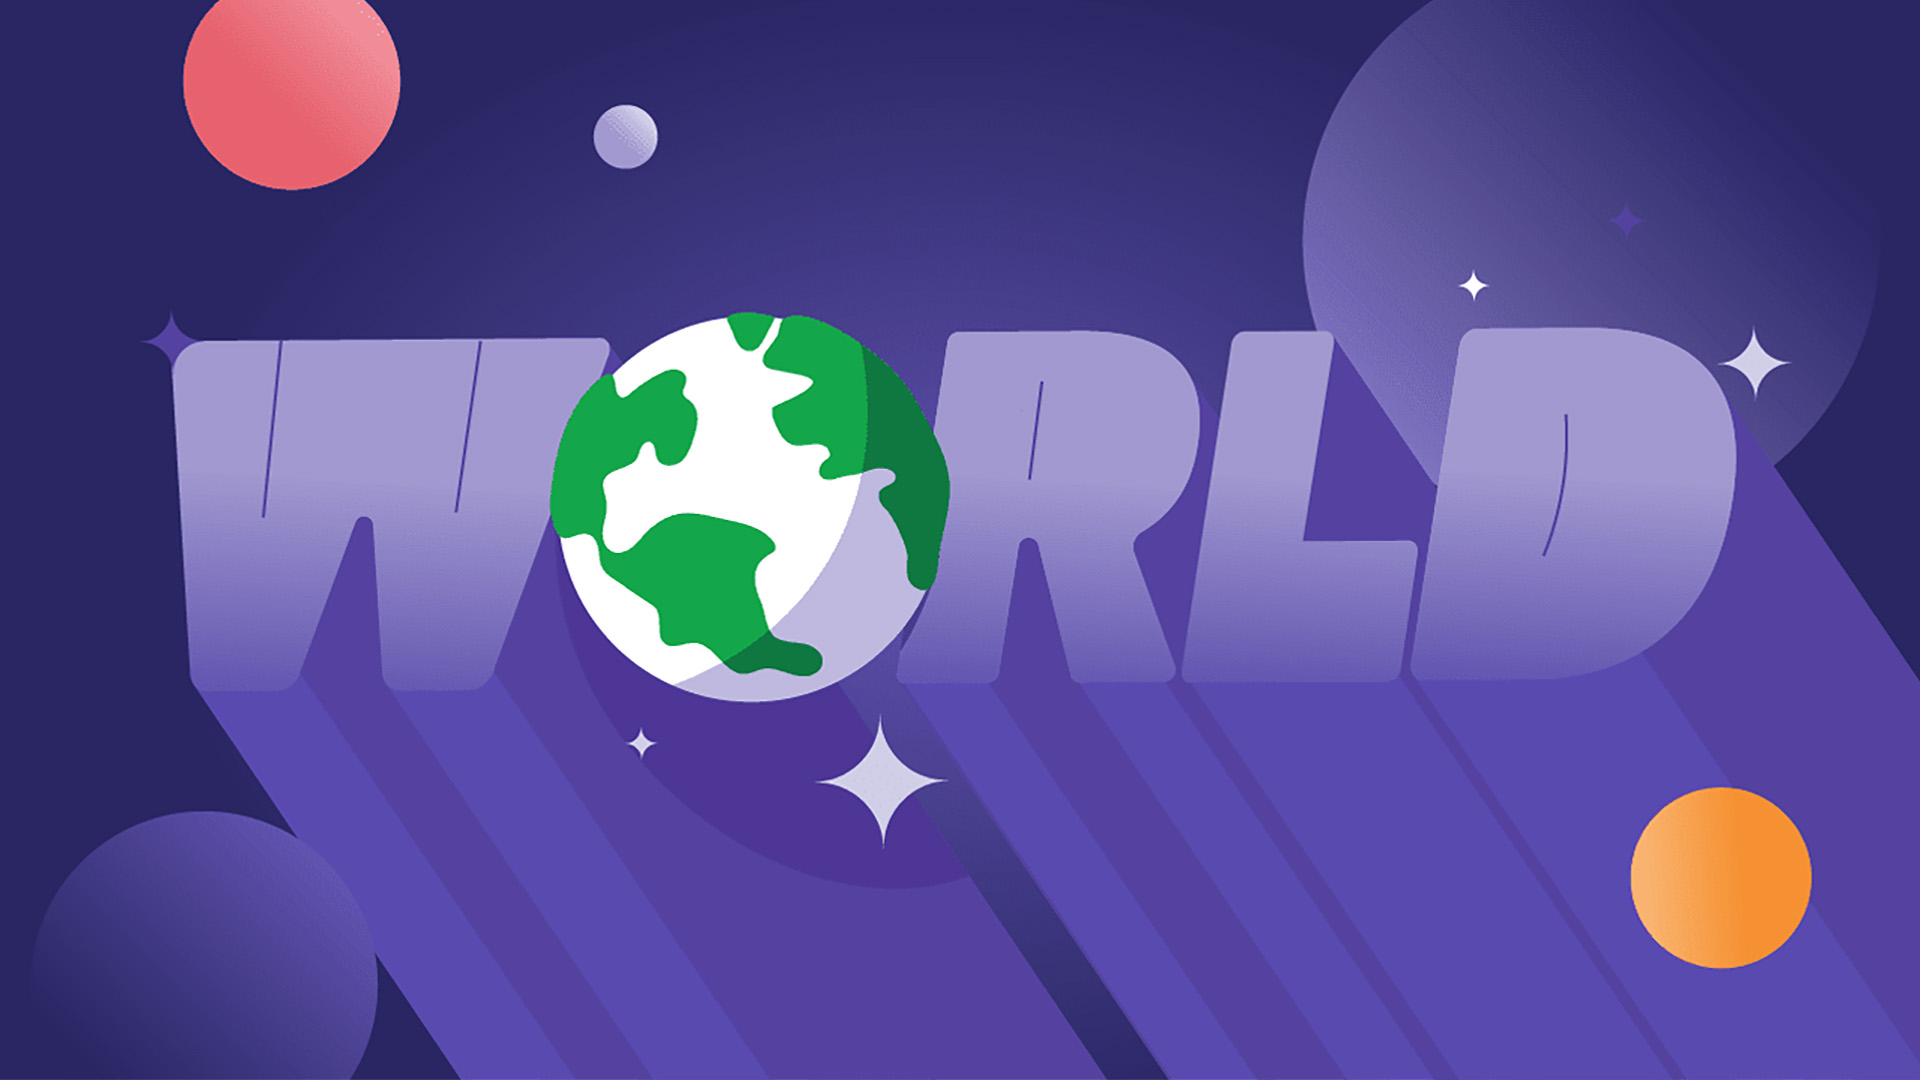 roofstudio_juni-learning_world-02-5